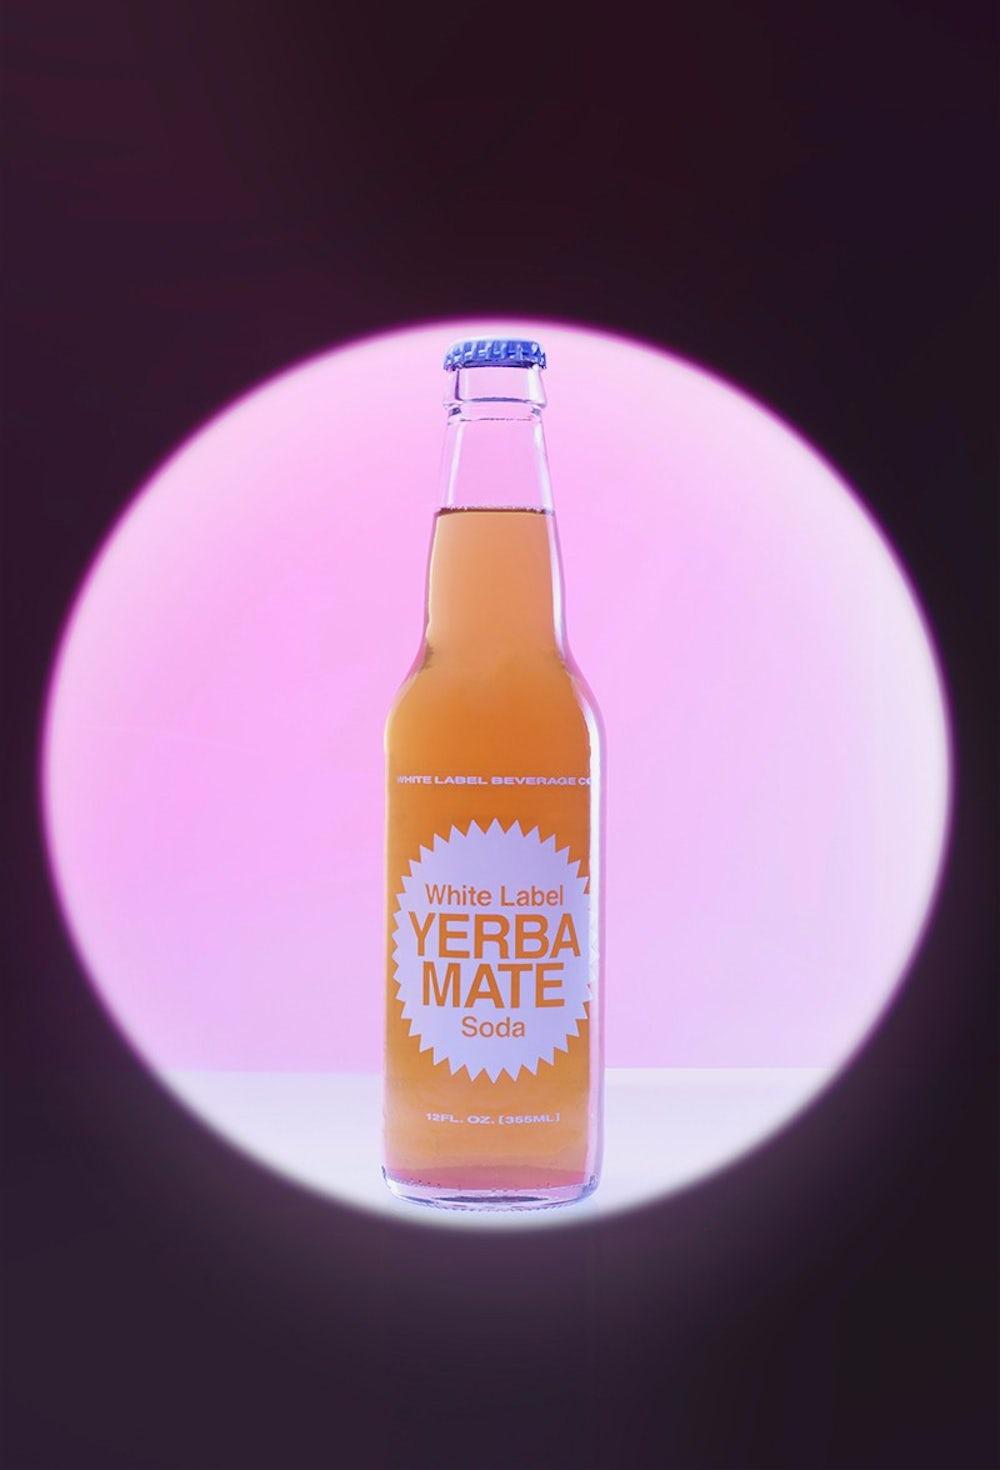 Brooklyn's White Label Maté sells a modern version of an ancient tea.